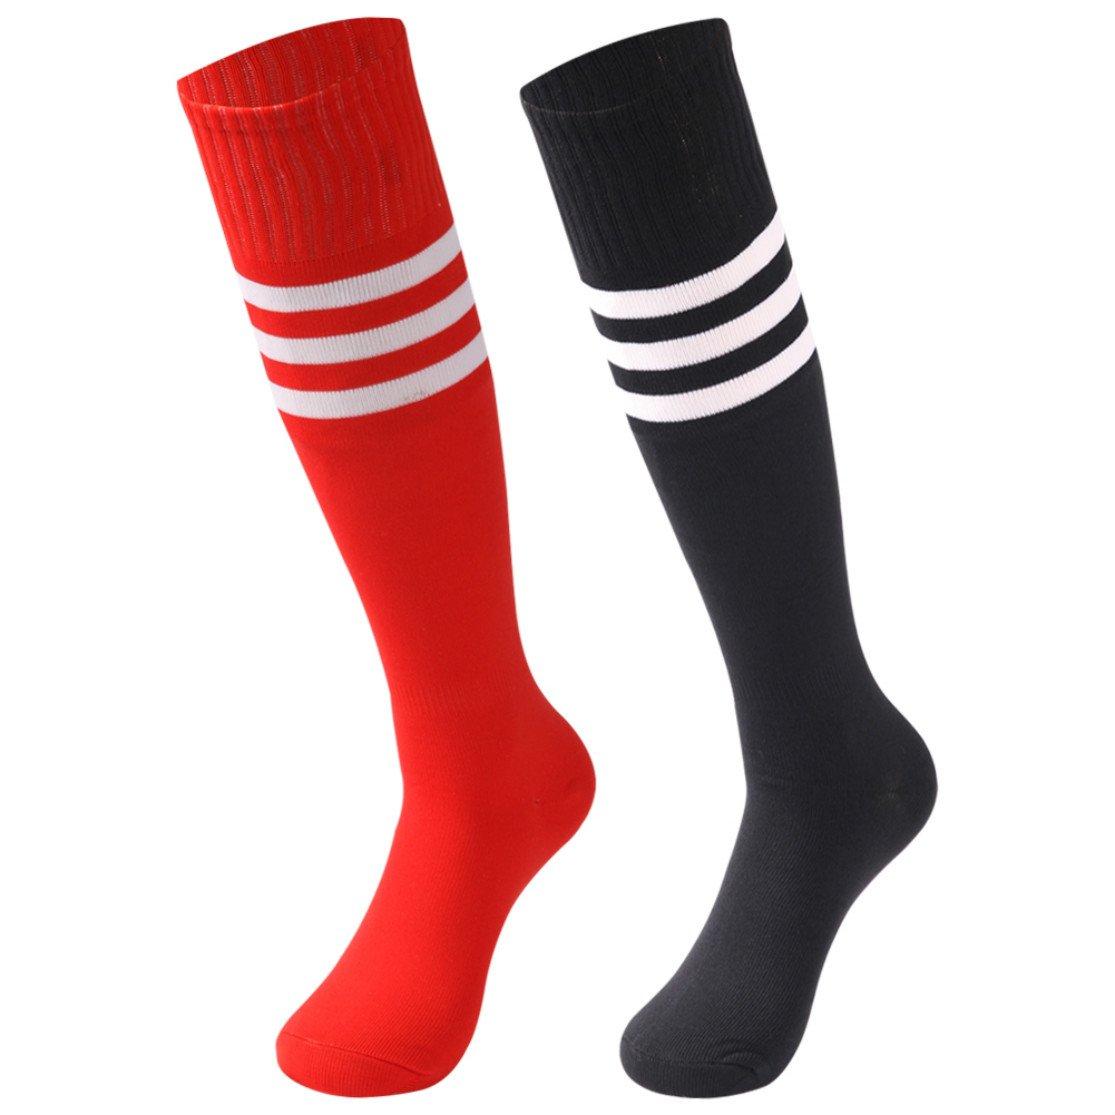 saounisi SOCKSHOSIERY メンズ B07D4DY4M3 2pairs-black+red  2pairs-black+red